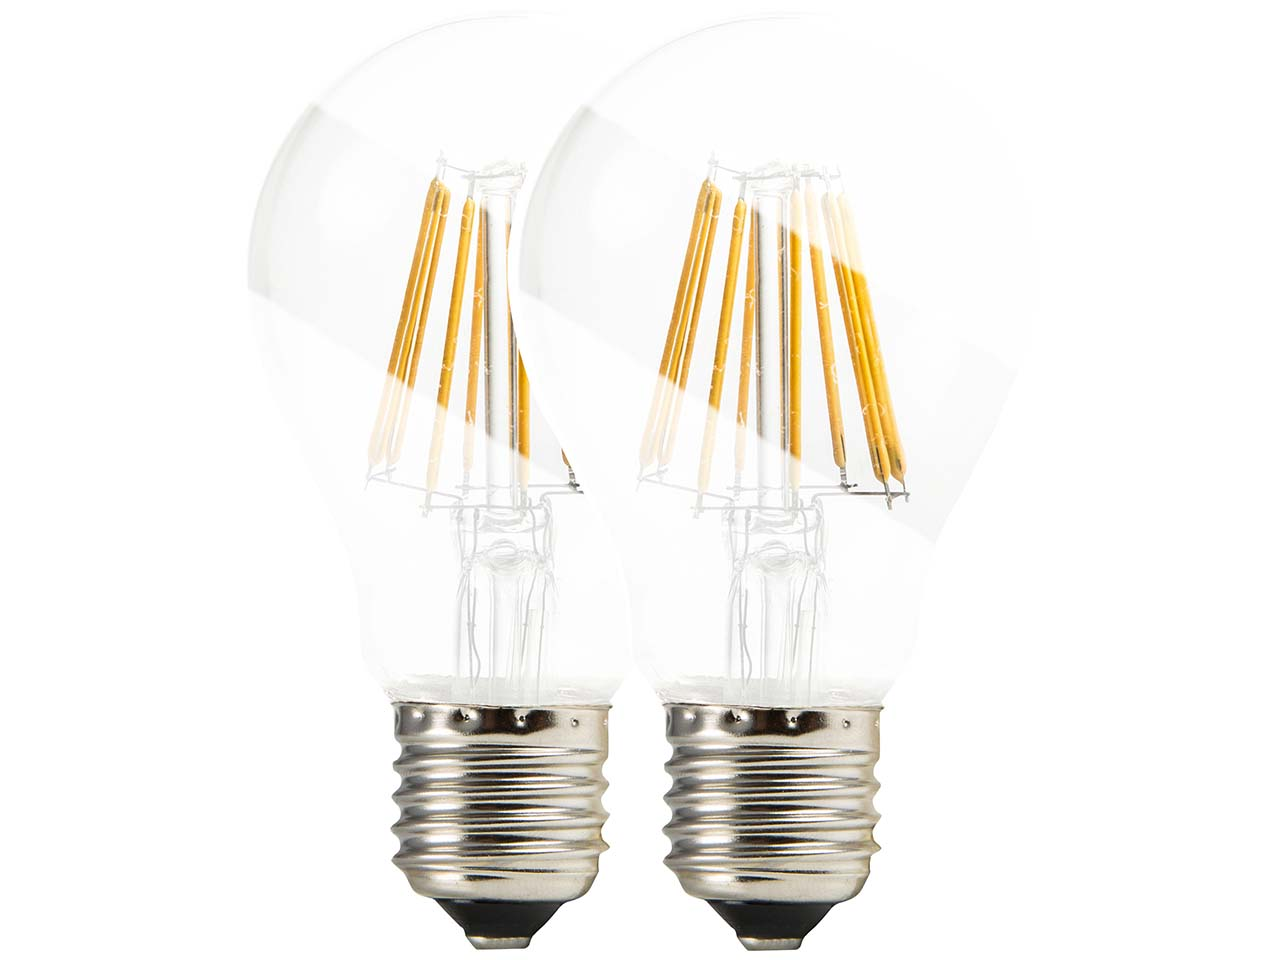 LED-Leuchtmittel - öko, fair einkaufen | memo.de